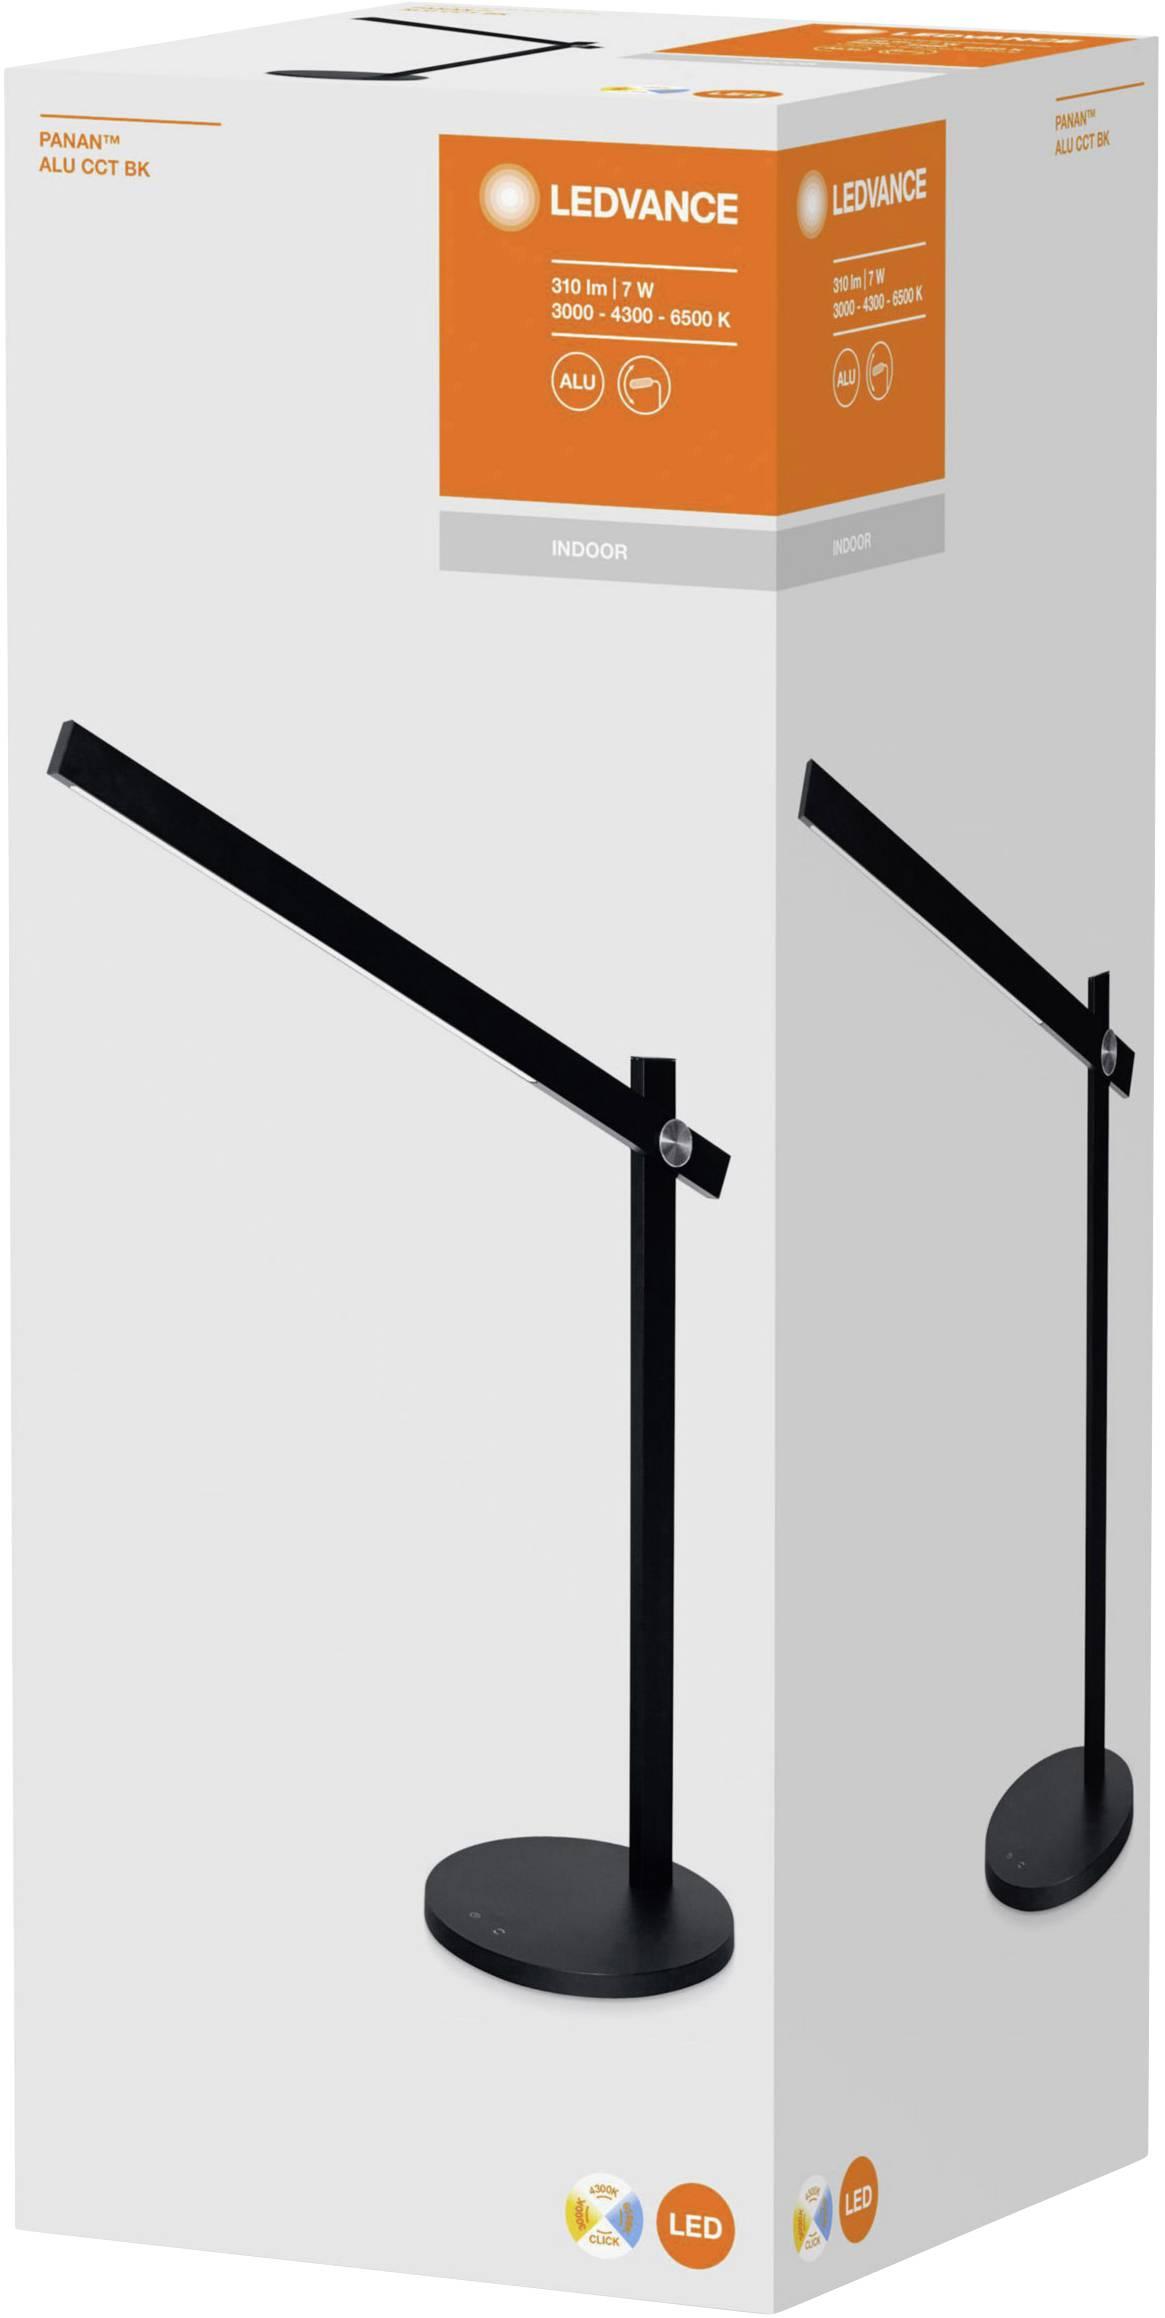 LEDVANCE PANAN Alu CCT L 4058075321281 Bureaulamp 7 W Warm wit, Koud wit, Daglicht wit Zwart (mat)